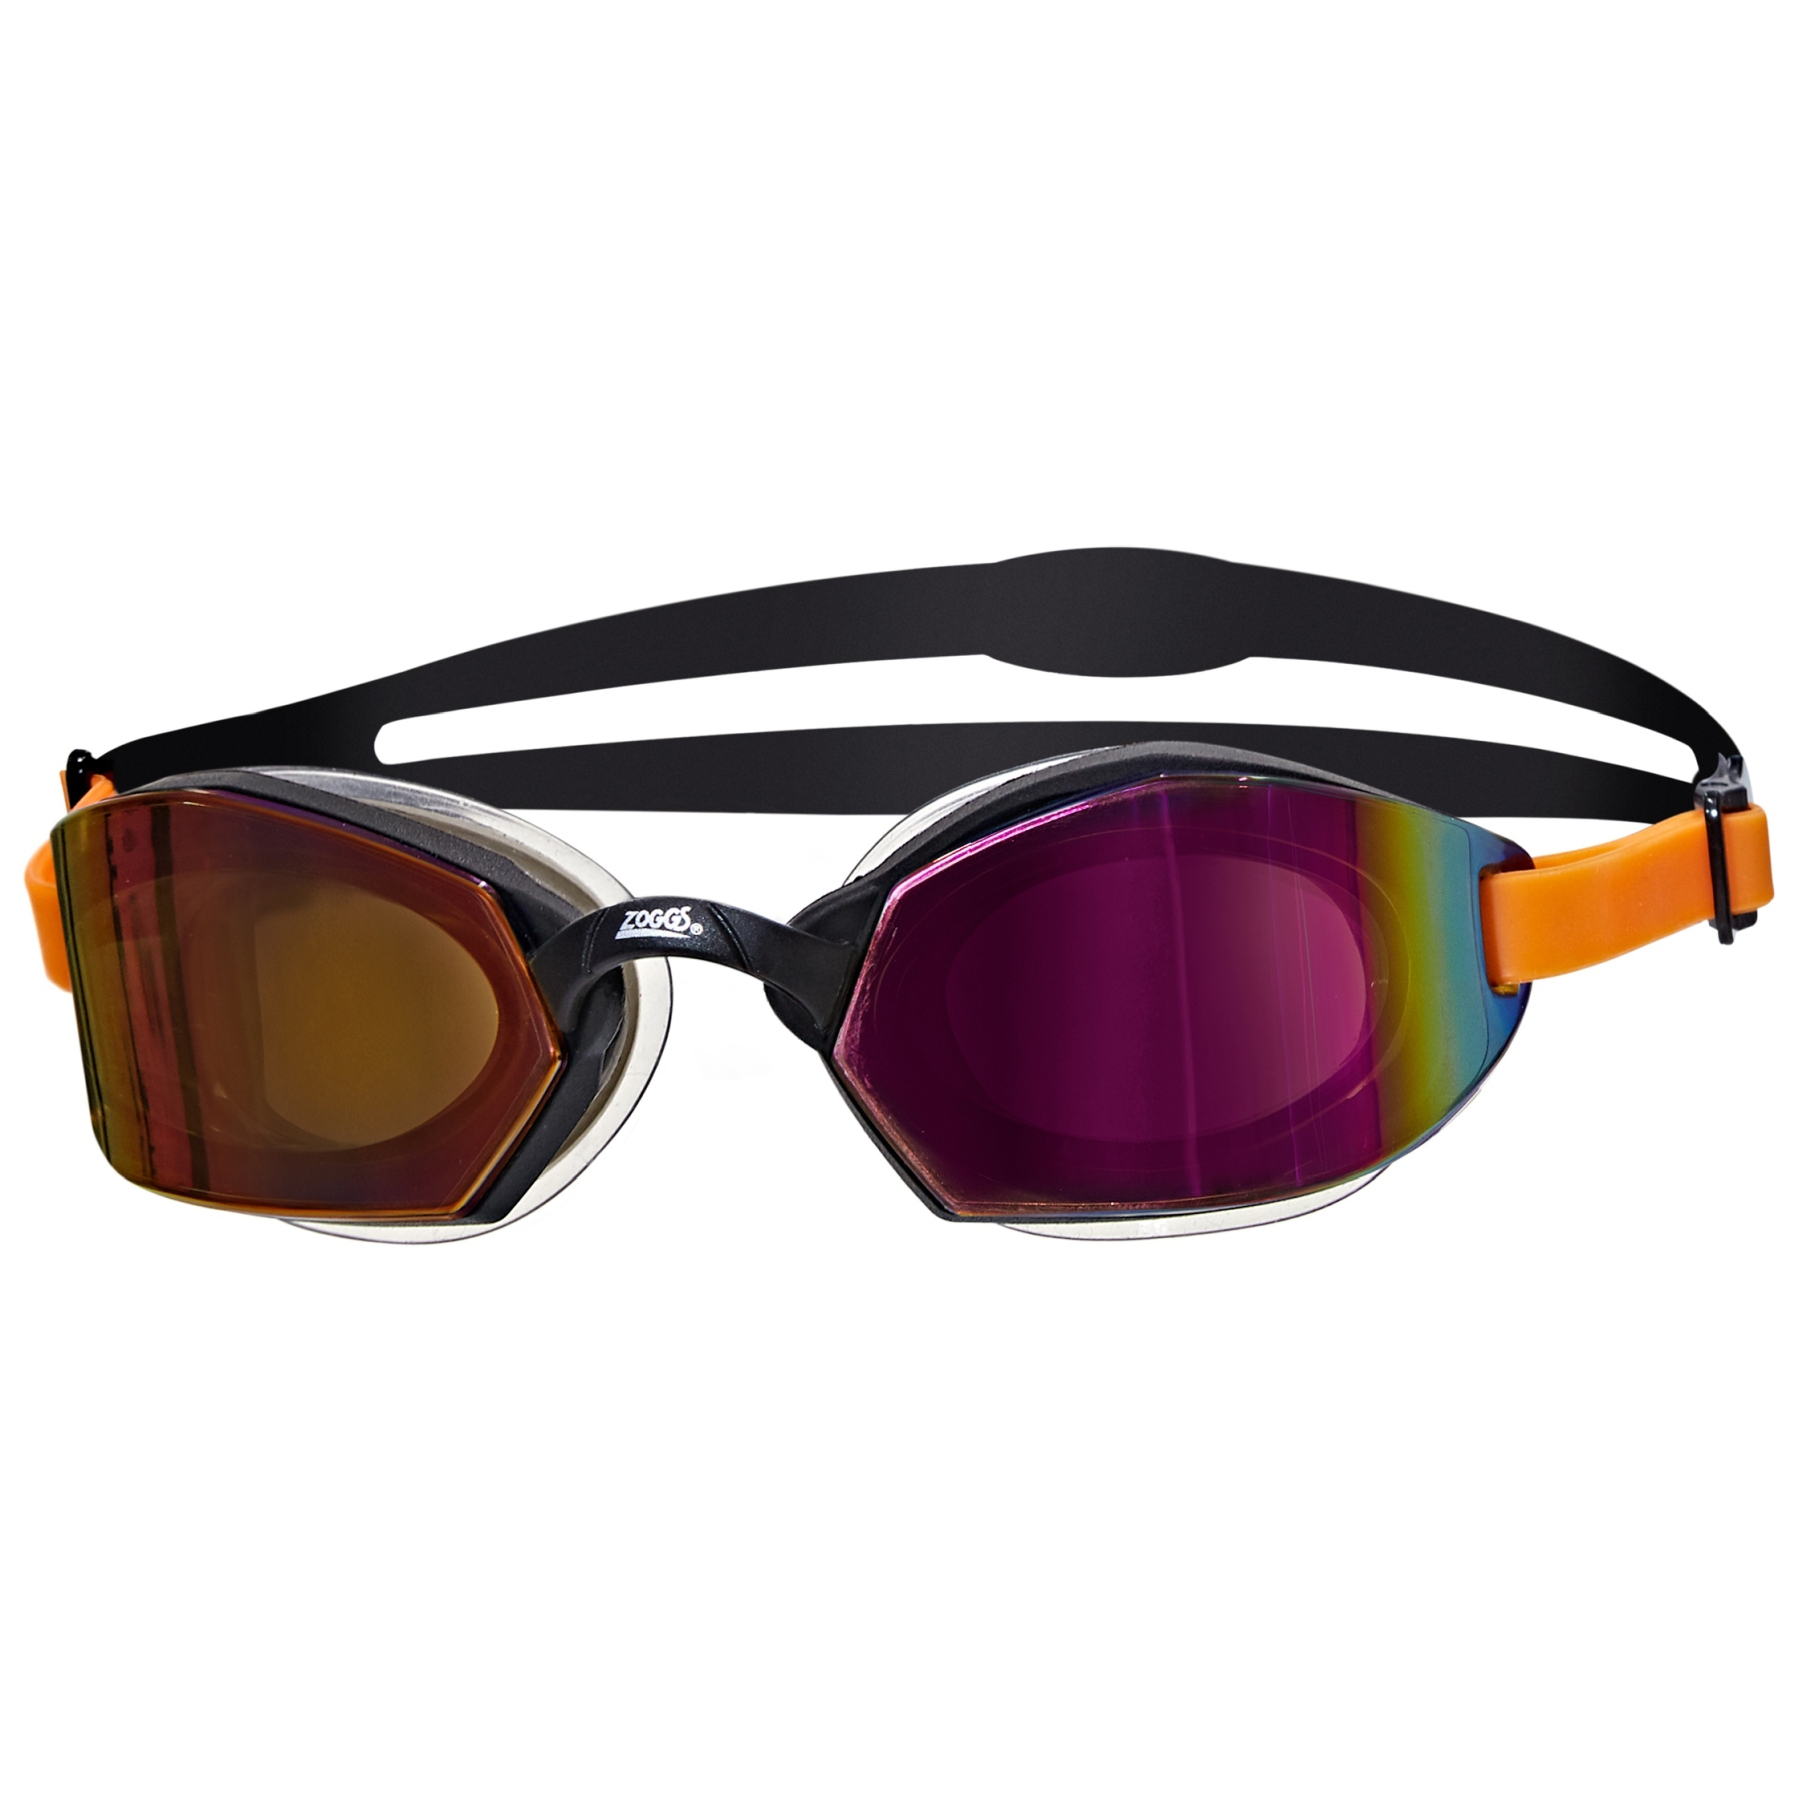 Zoggs Ultima Air Titanium Gafas de natación - negro/gris/titanio